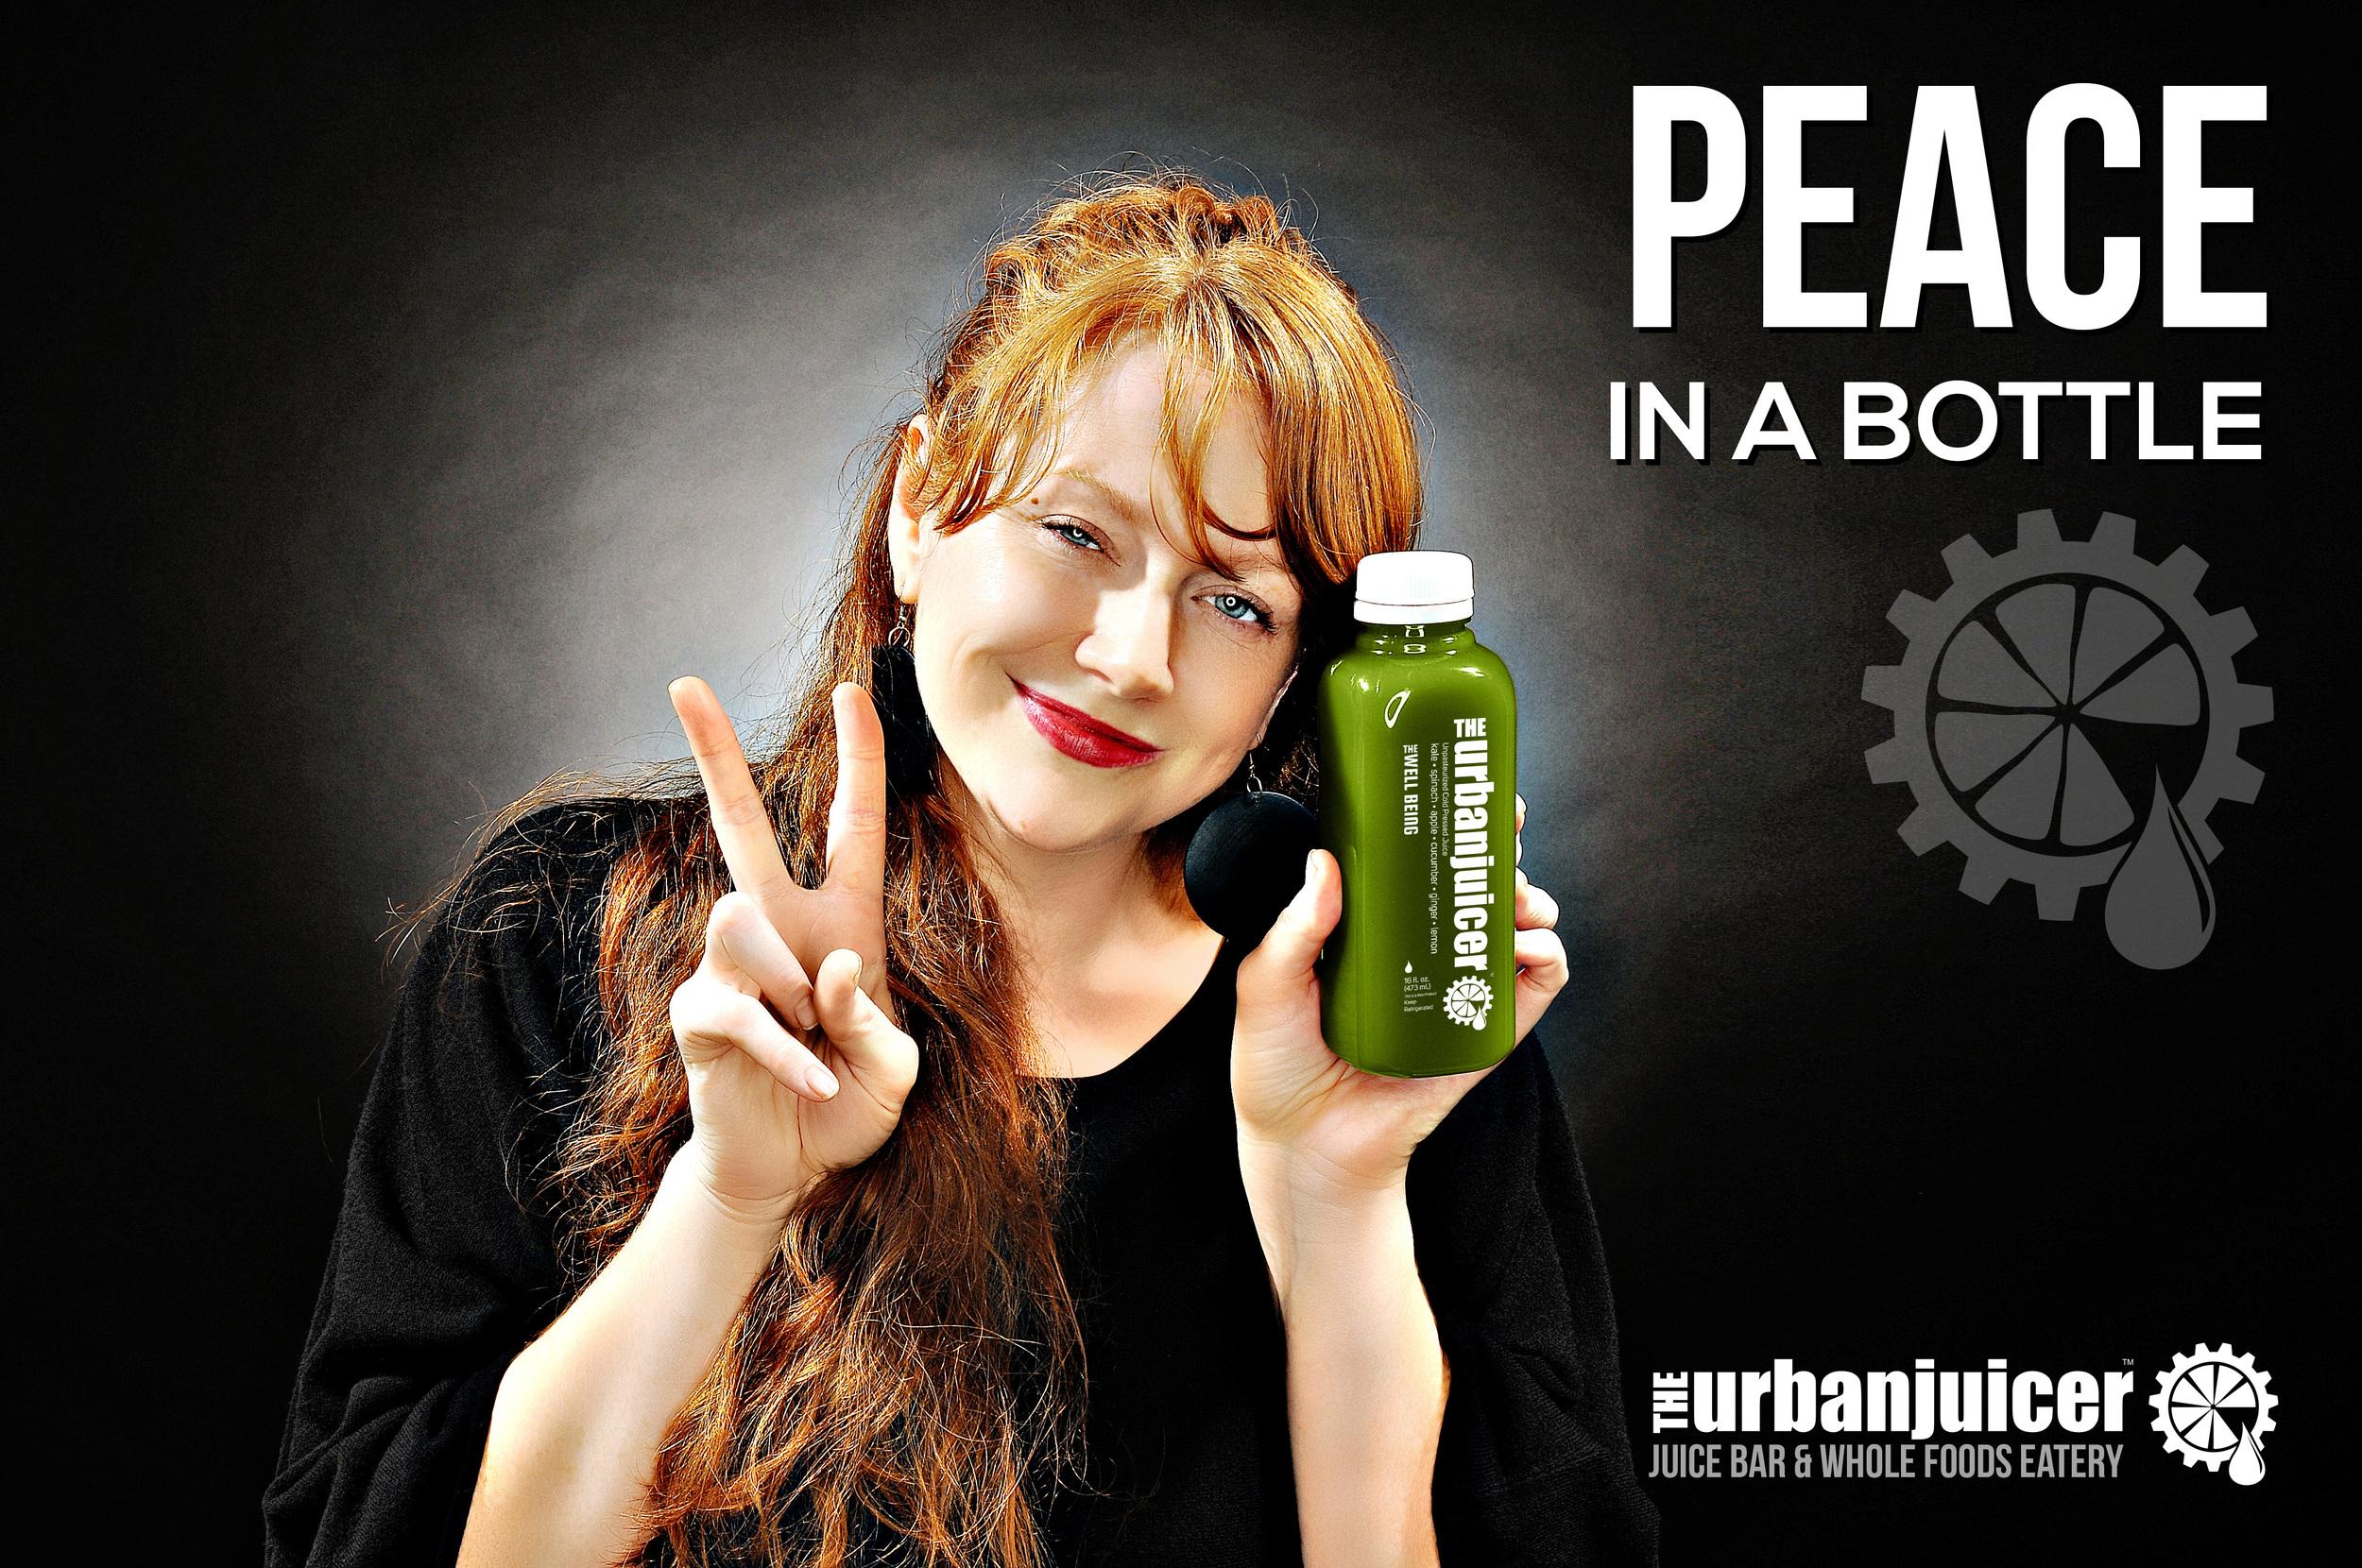 Nora-Total-Green-Black-BG-Peace-Bonus-01.jpg